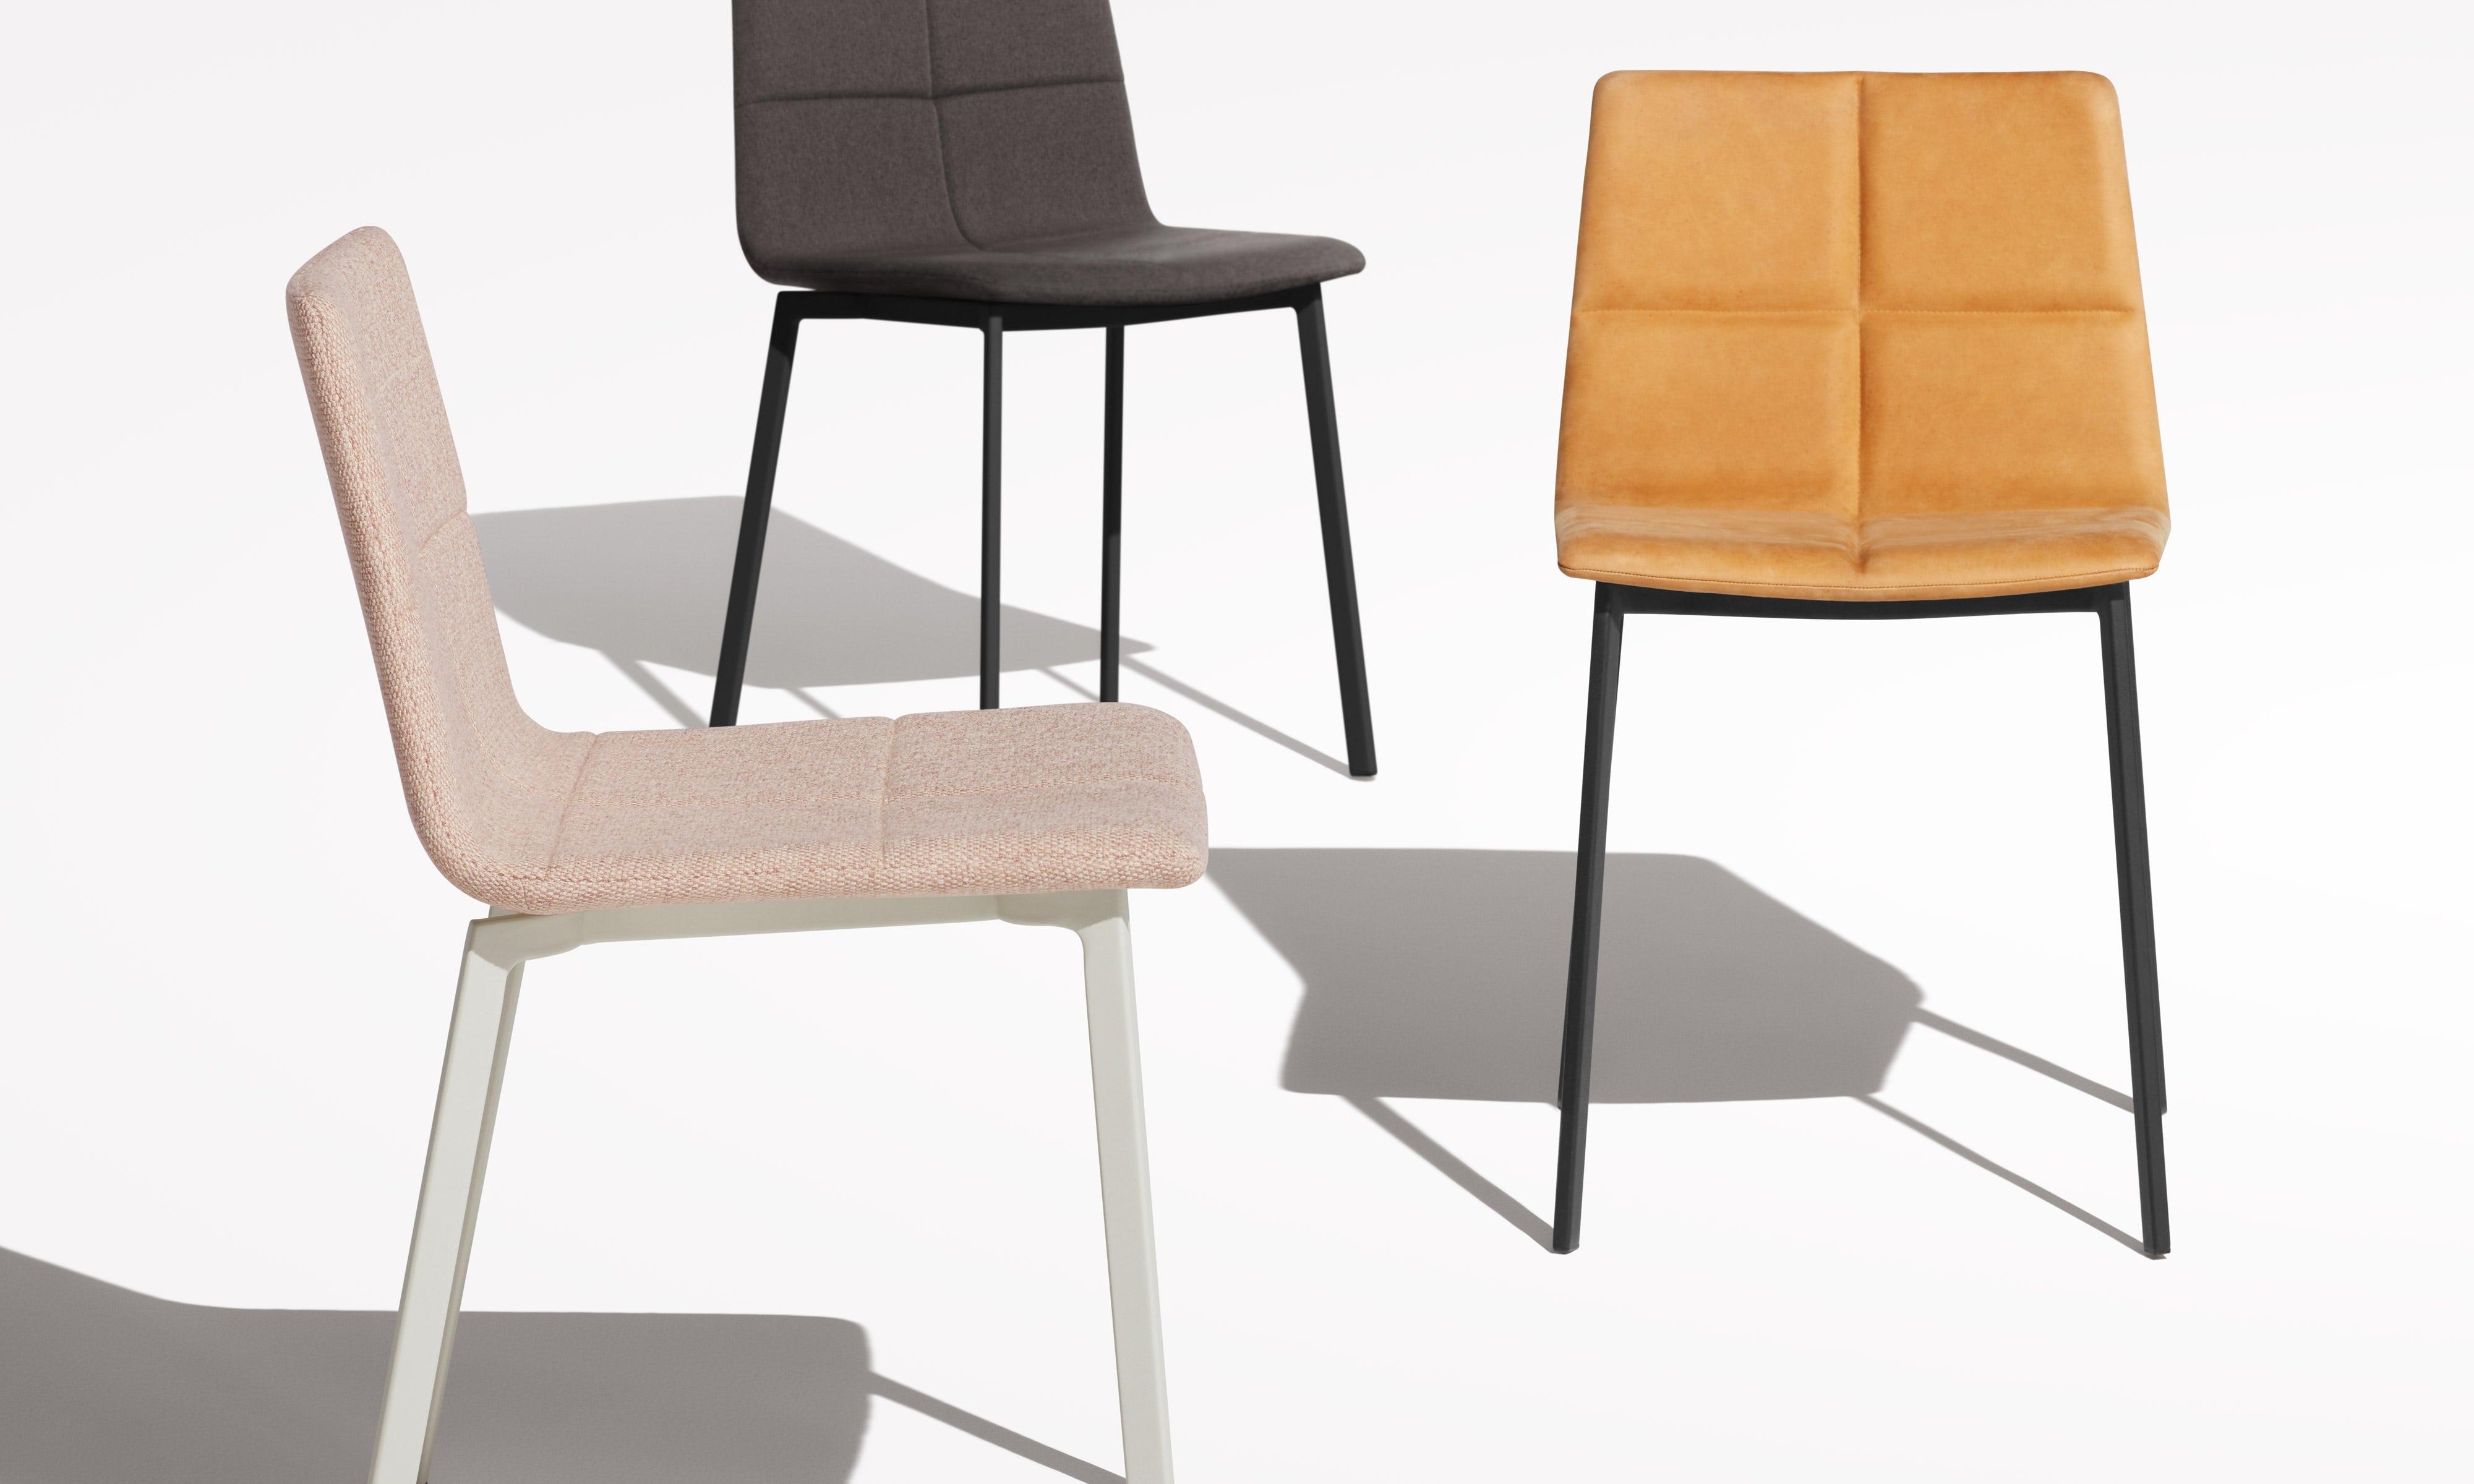 Between Us Modern Dining Chair by Blu Dot